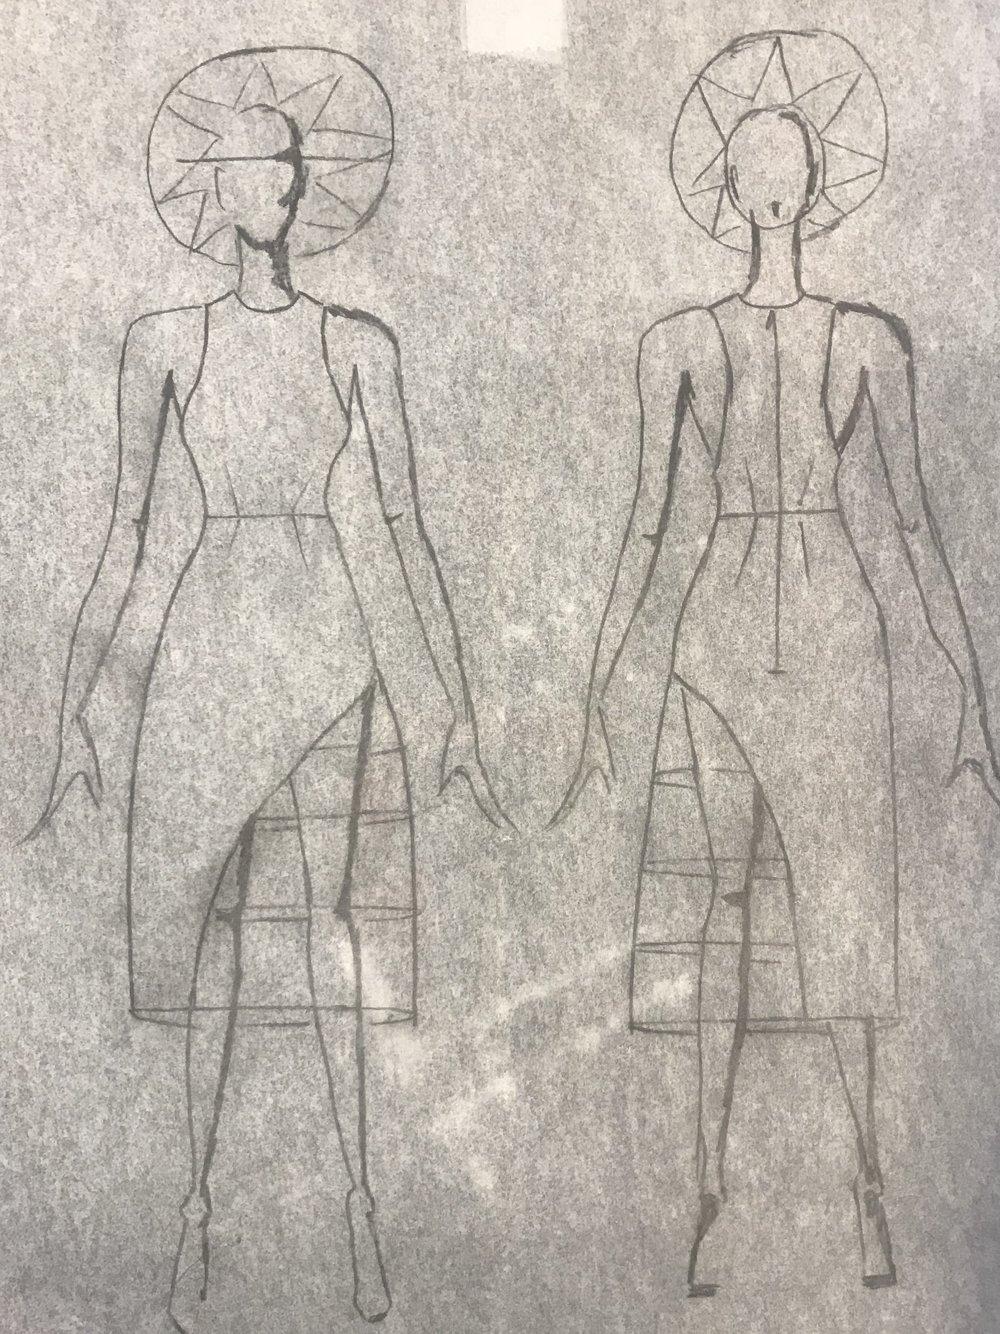 Initial Sketch